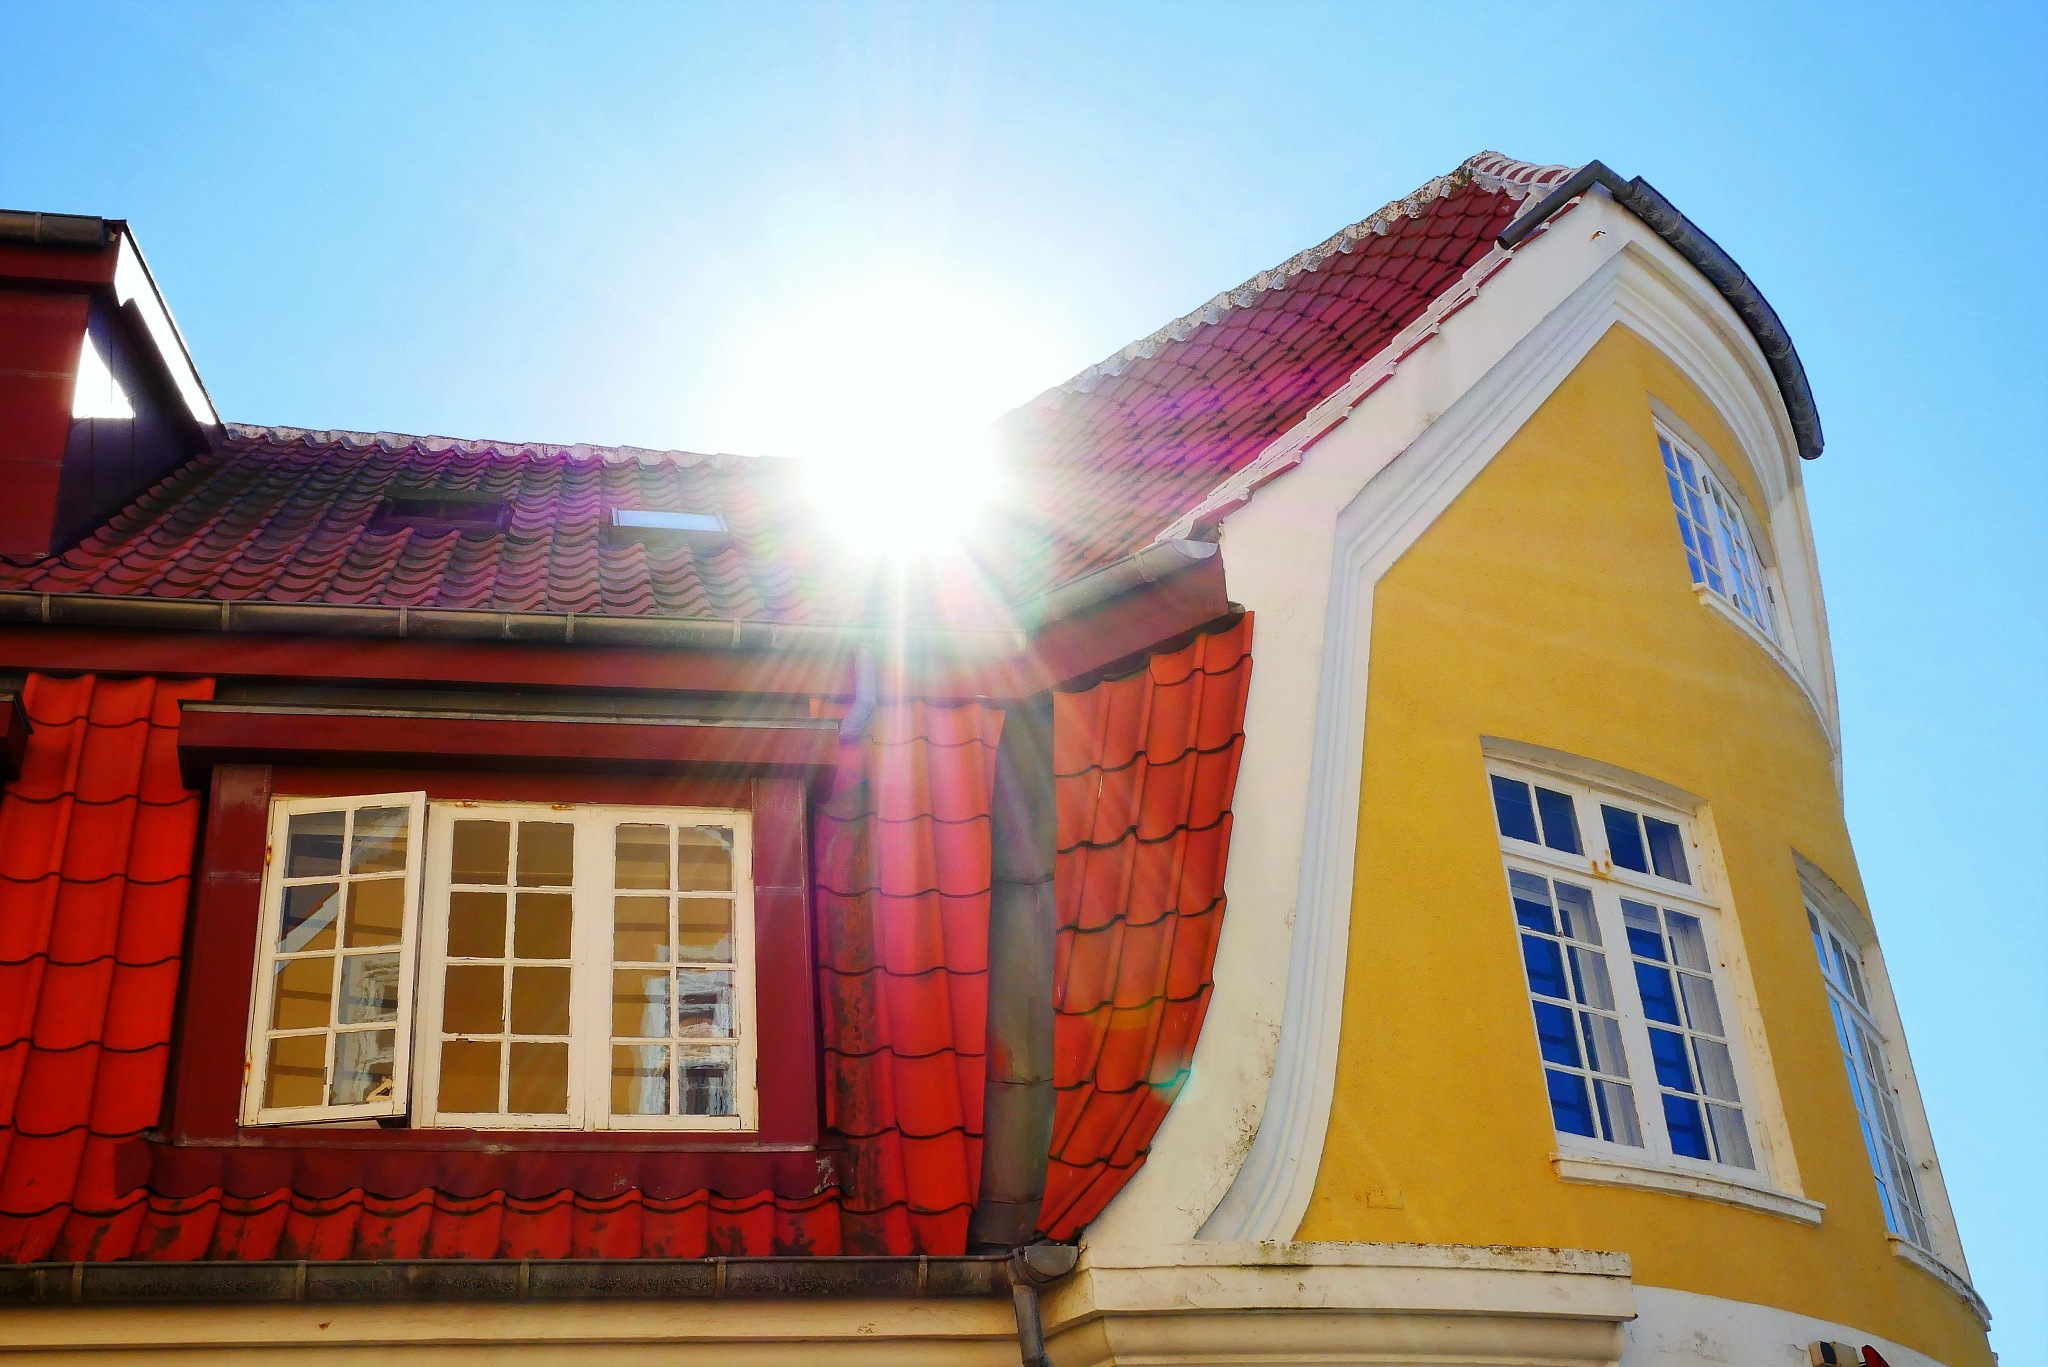 Lovely day in Skagen! by Cicki Jarneberg